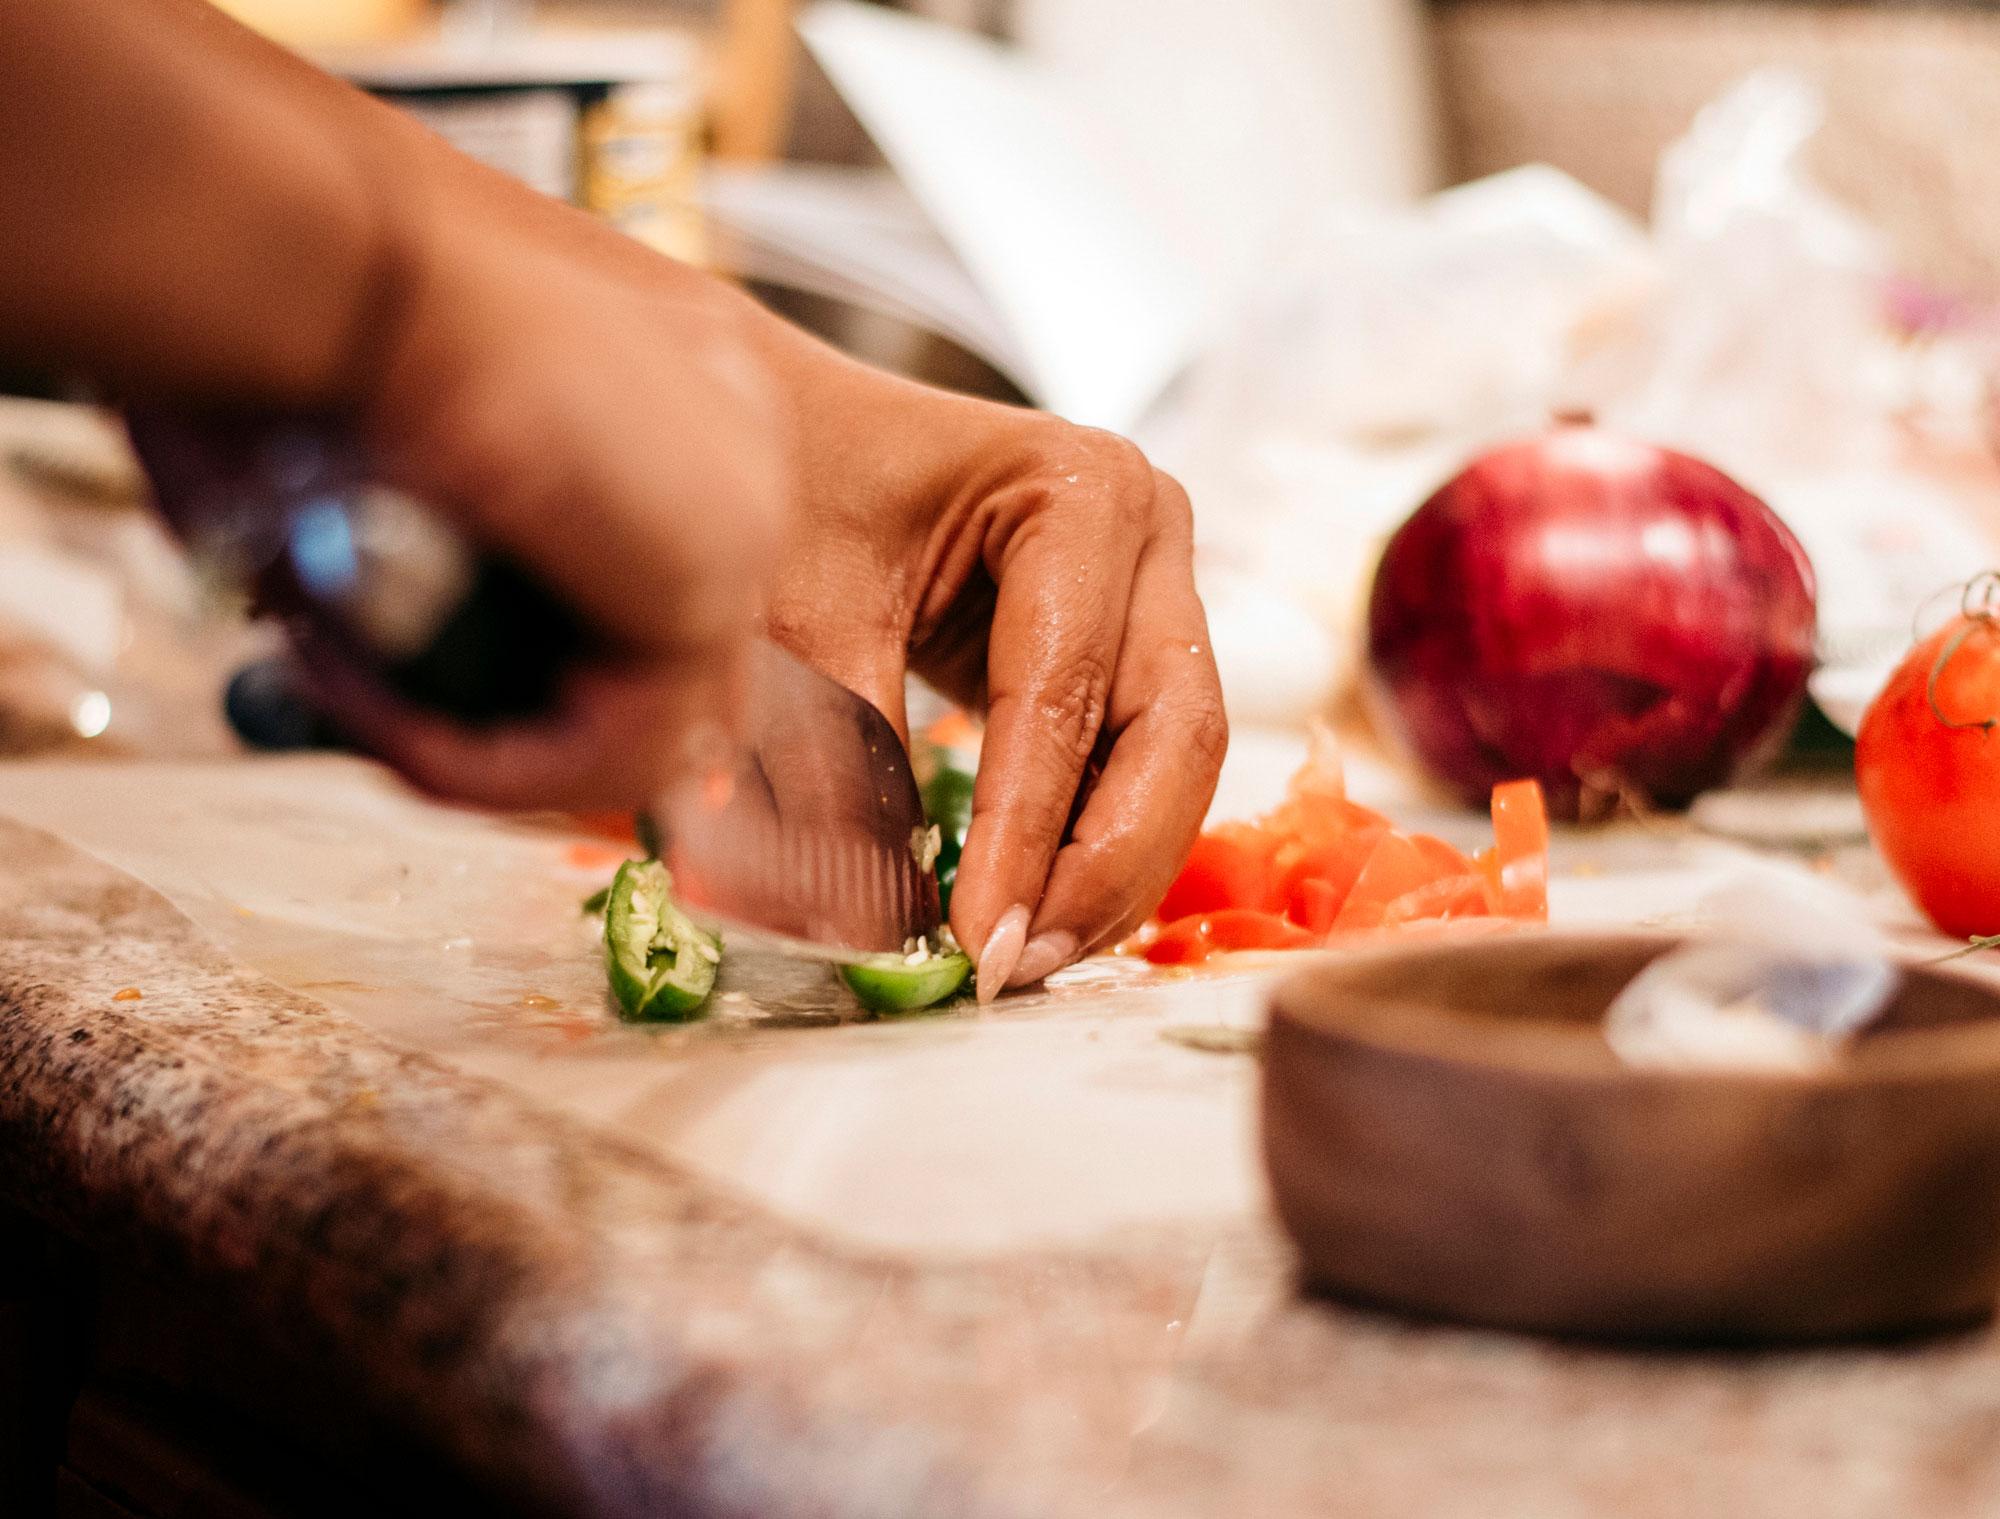 Los_Angeles_Food_photographer_Rebecca_Peloquin_Sri_Lankan_Food_006.JPG